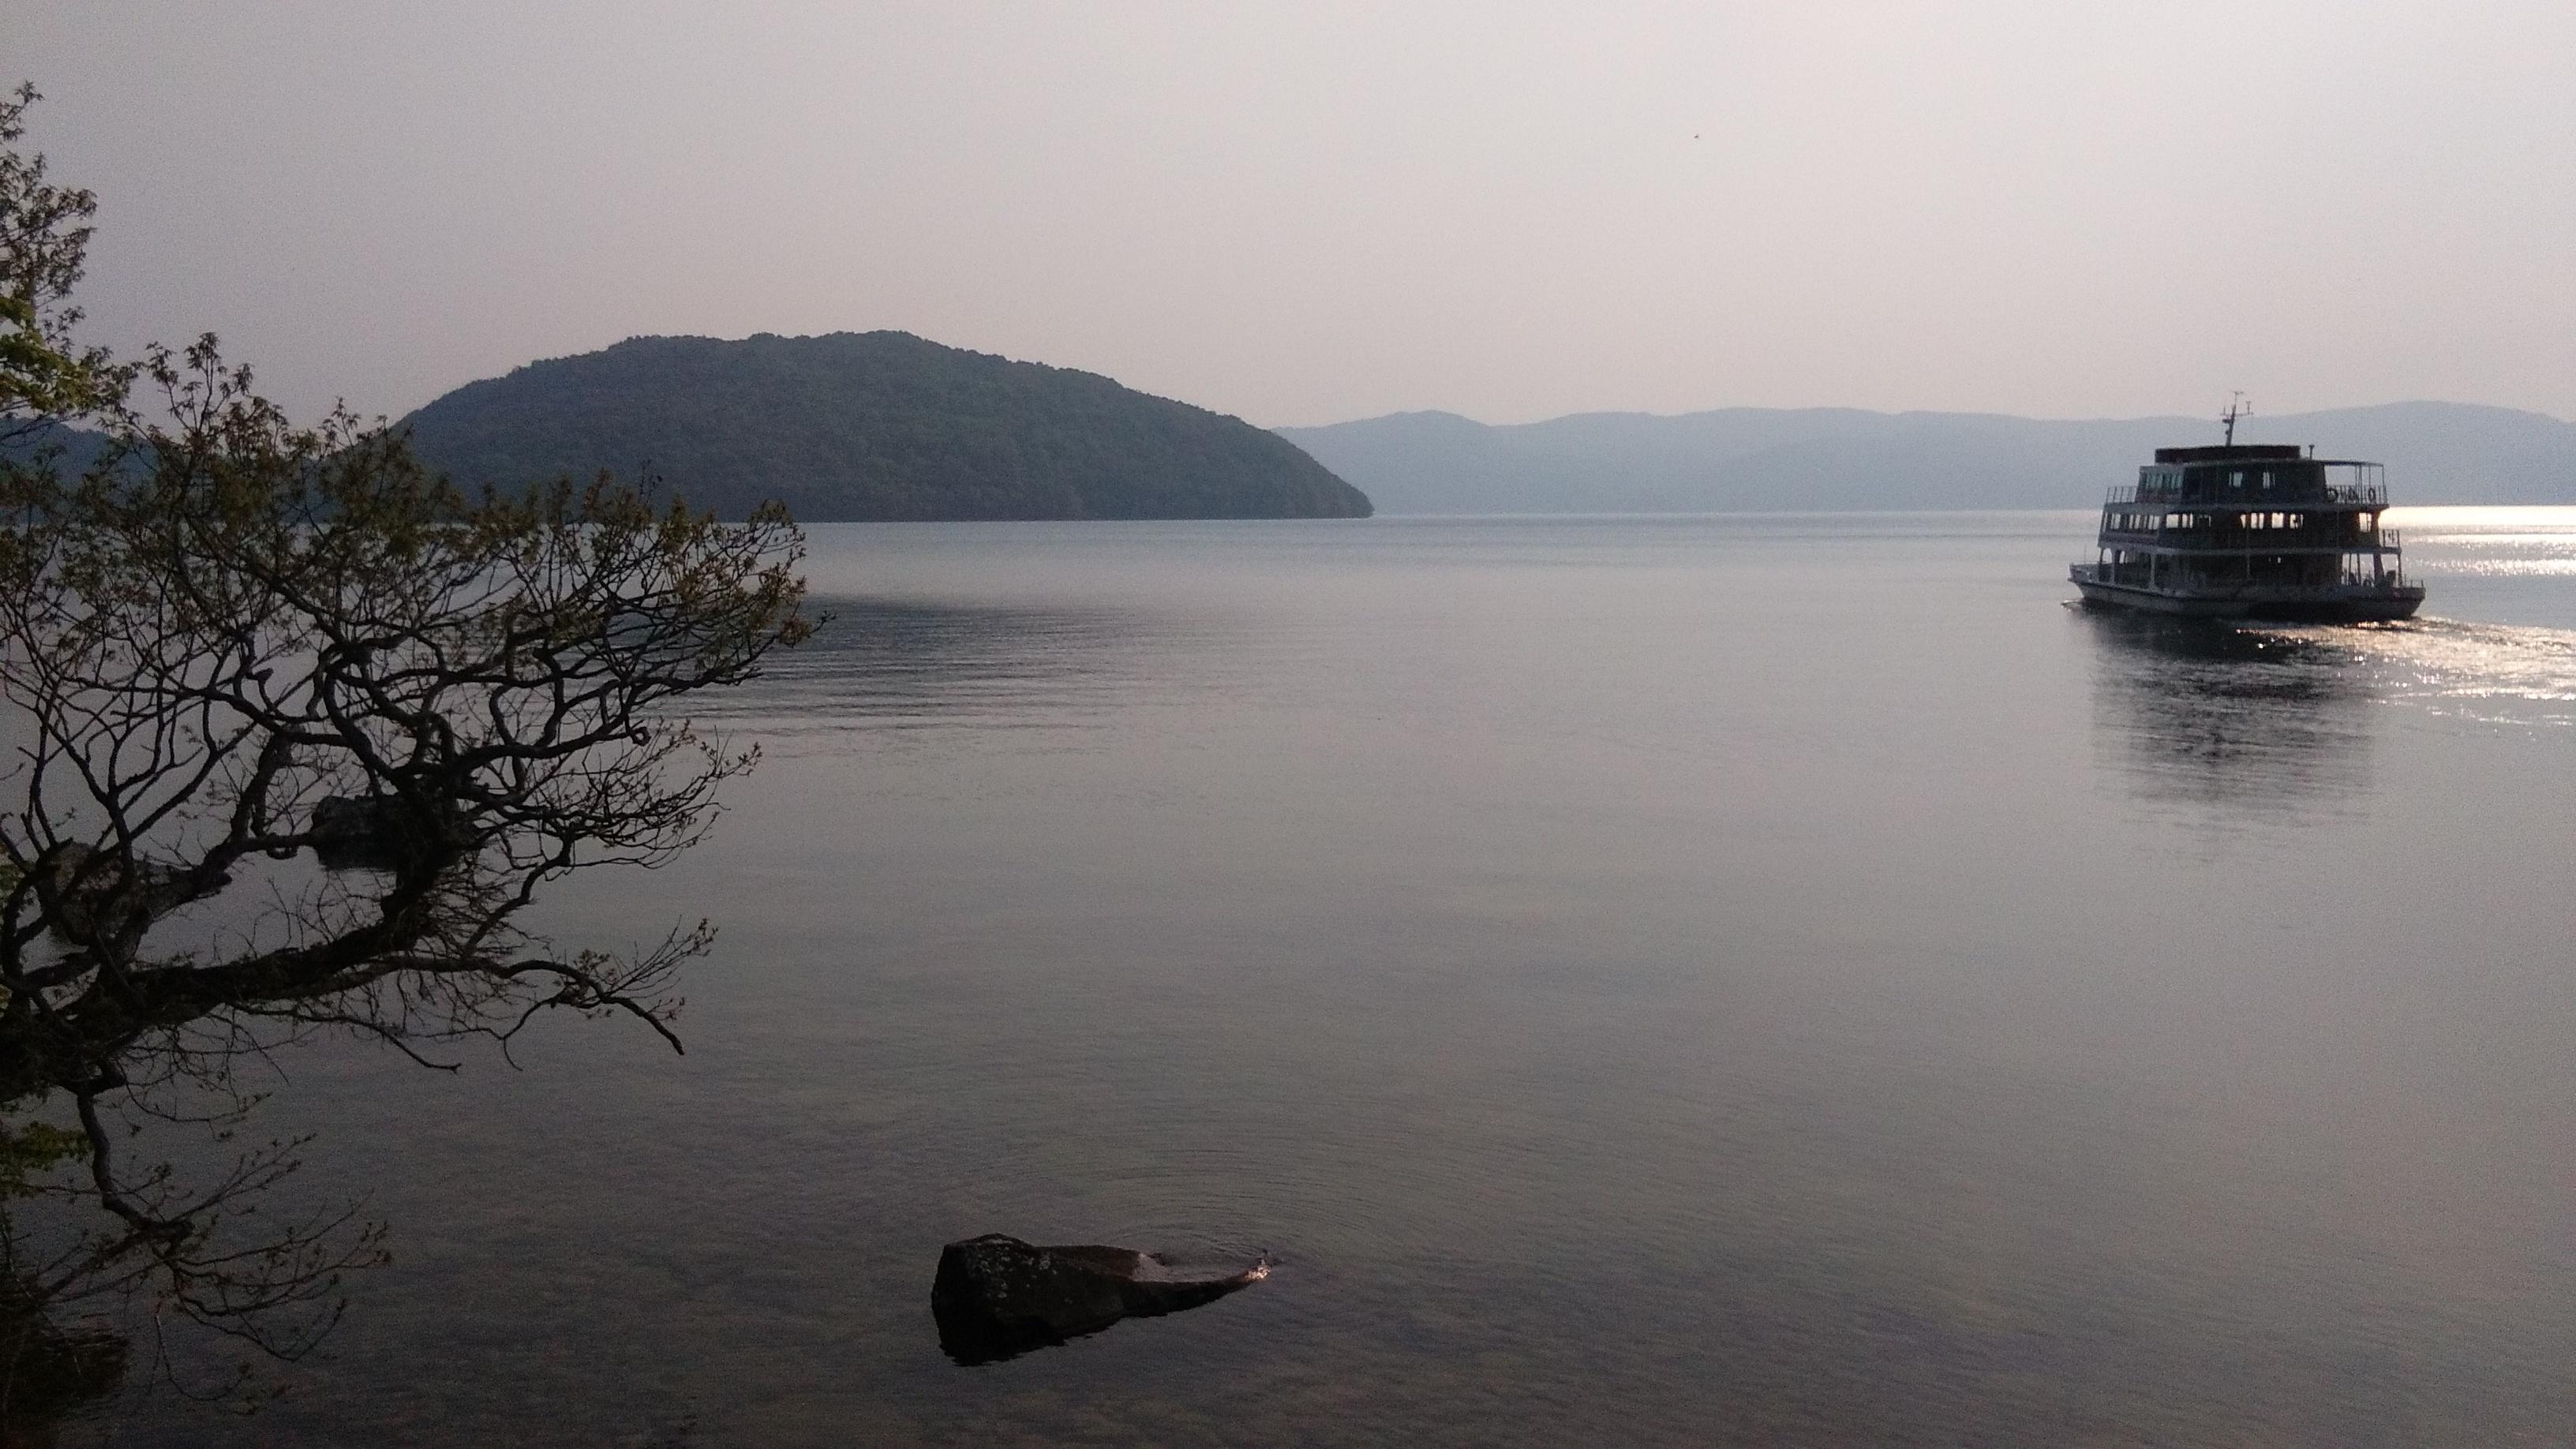 Ferry at lake Towada